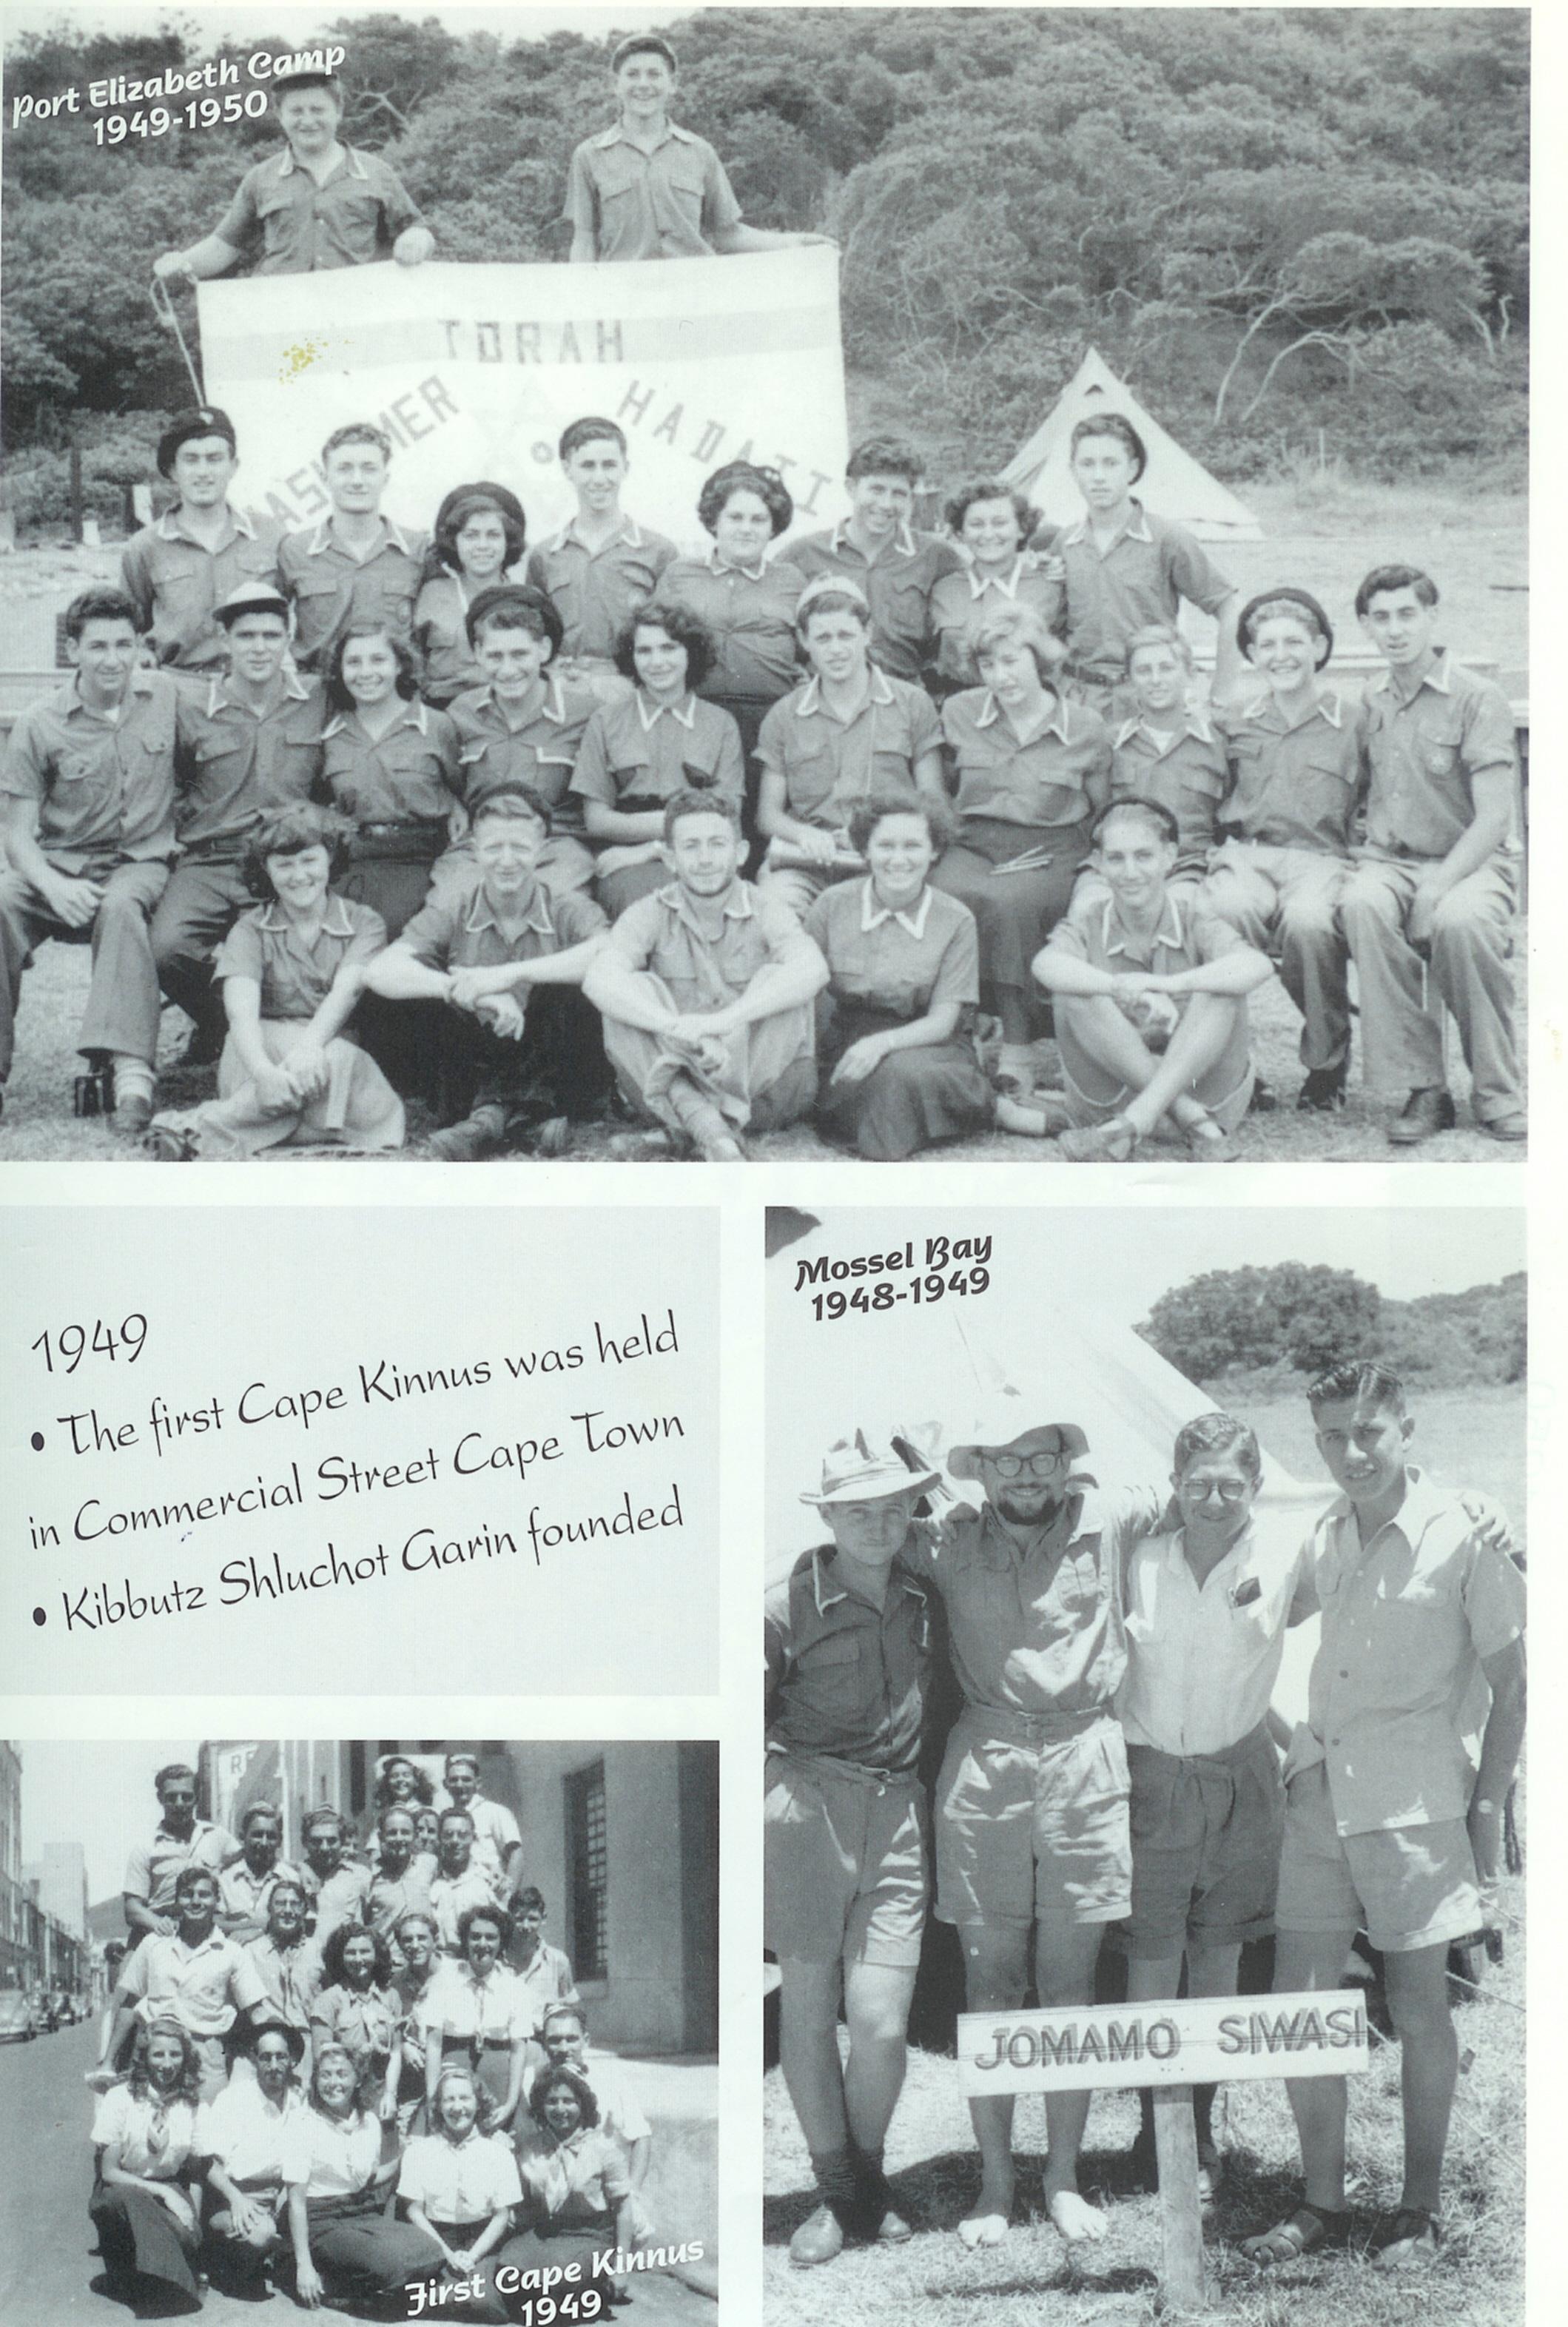 PE- 1949-'50, Mossel Bay '48-'49, Chevra CT'49